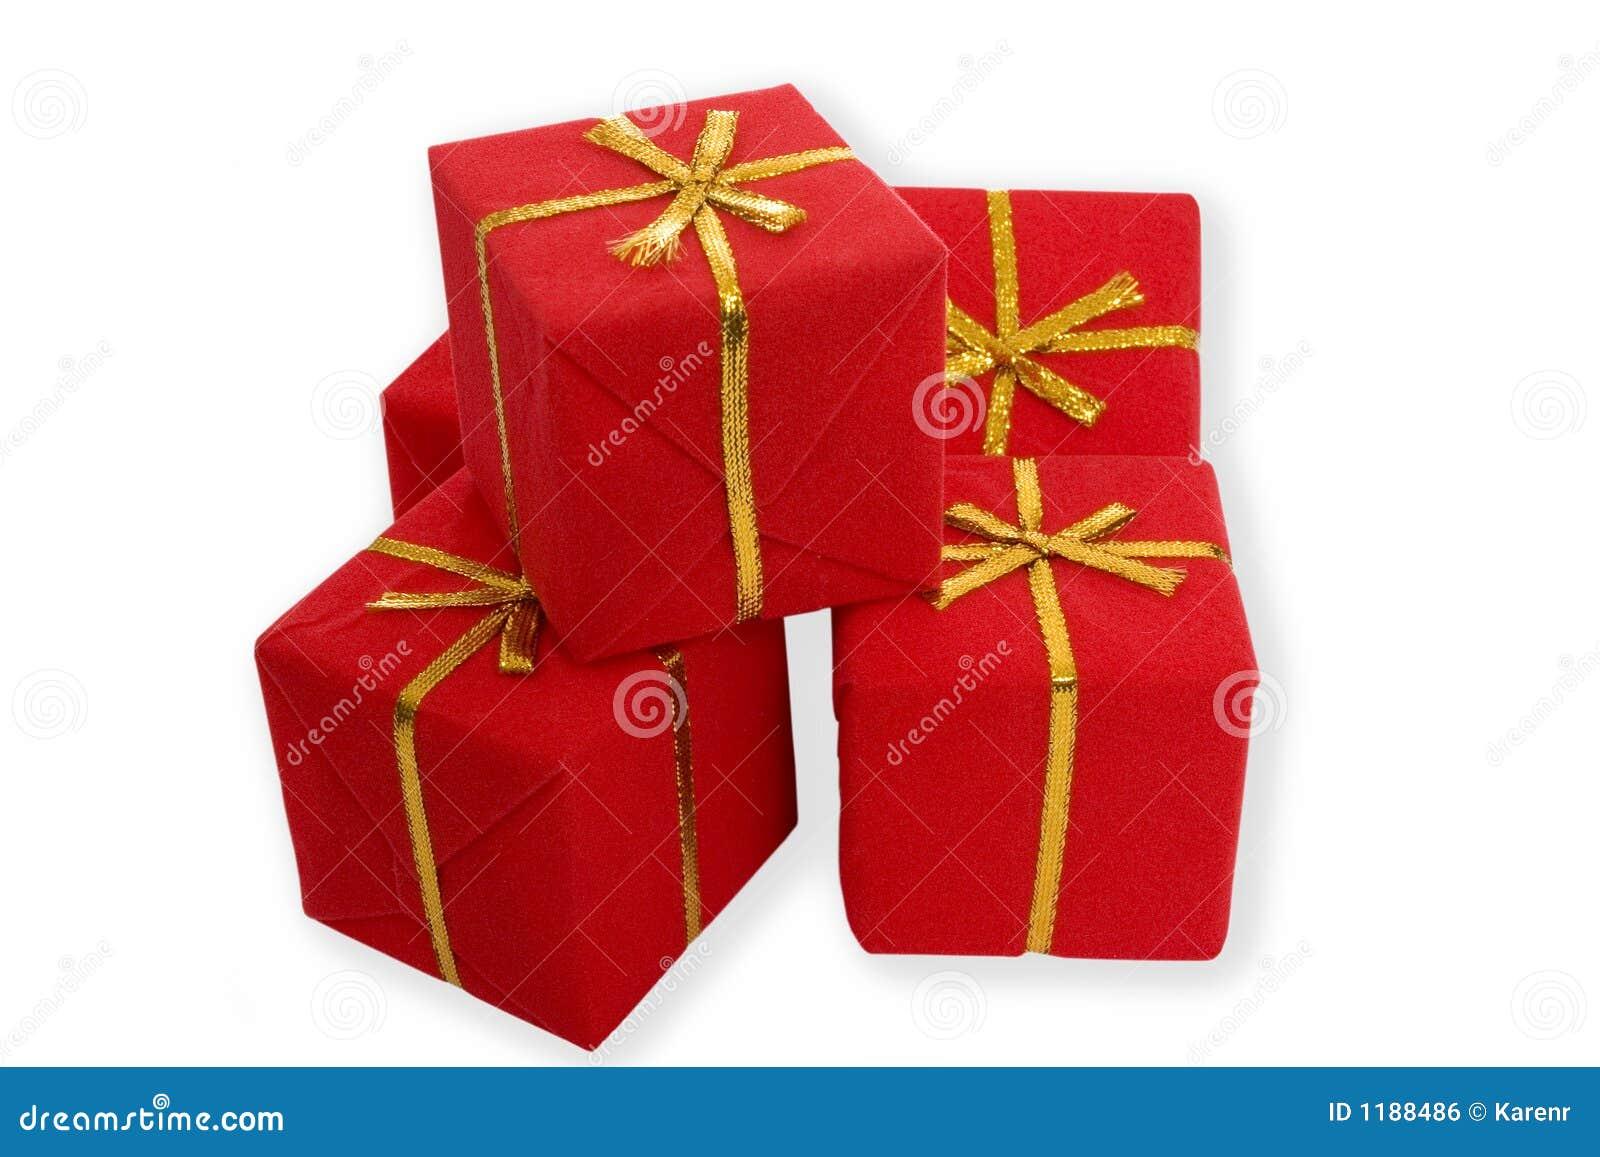 кладет подарки в коробку